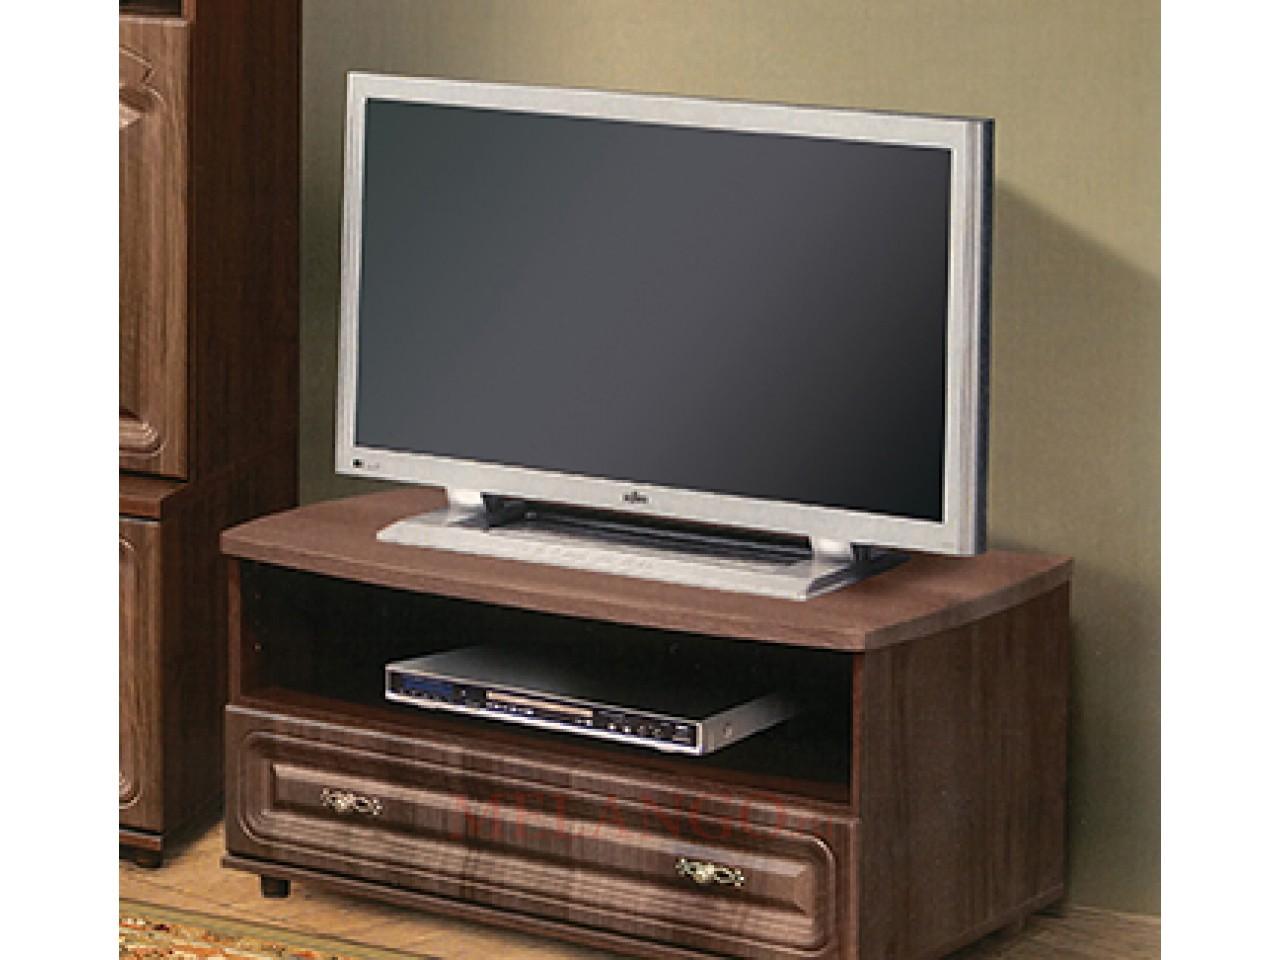 Тумба под телевизор в гостиную Романтика ВК-09-06